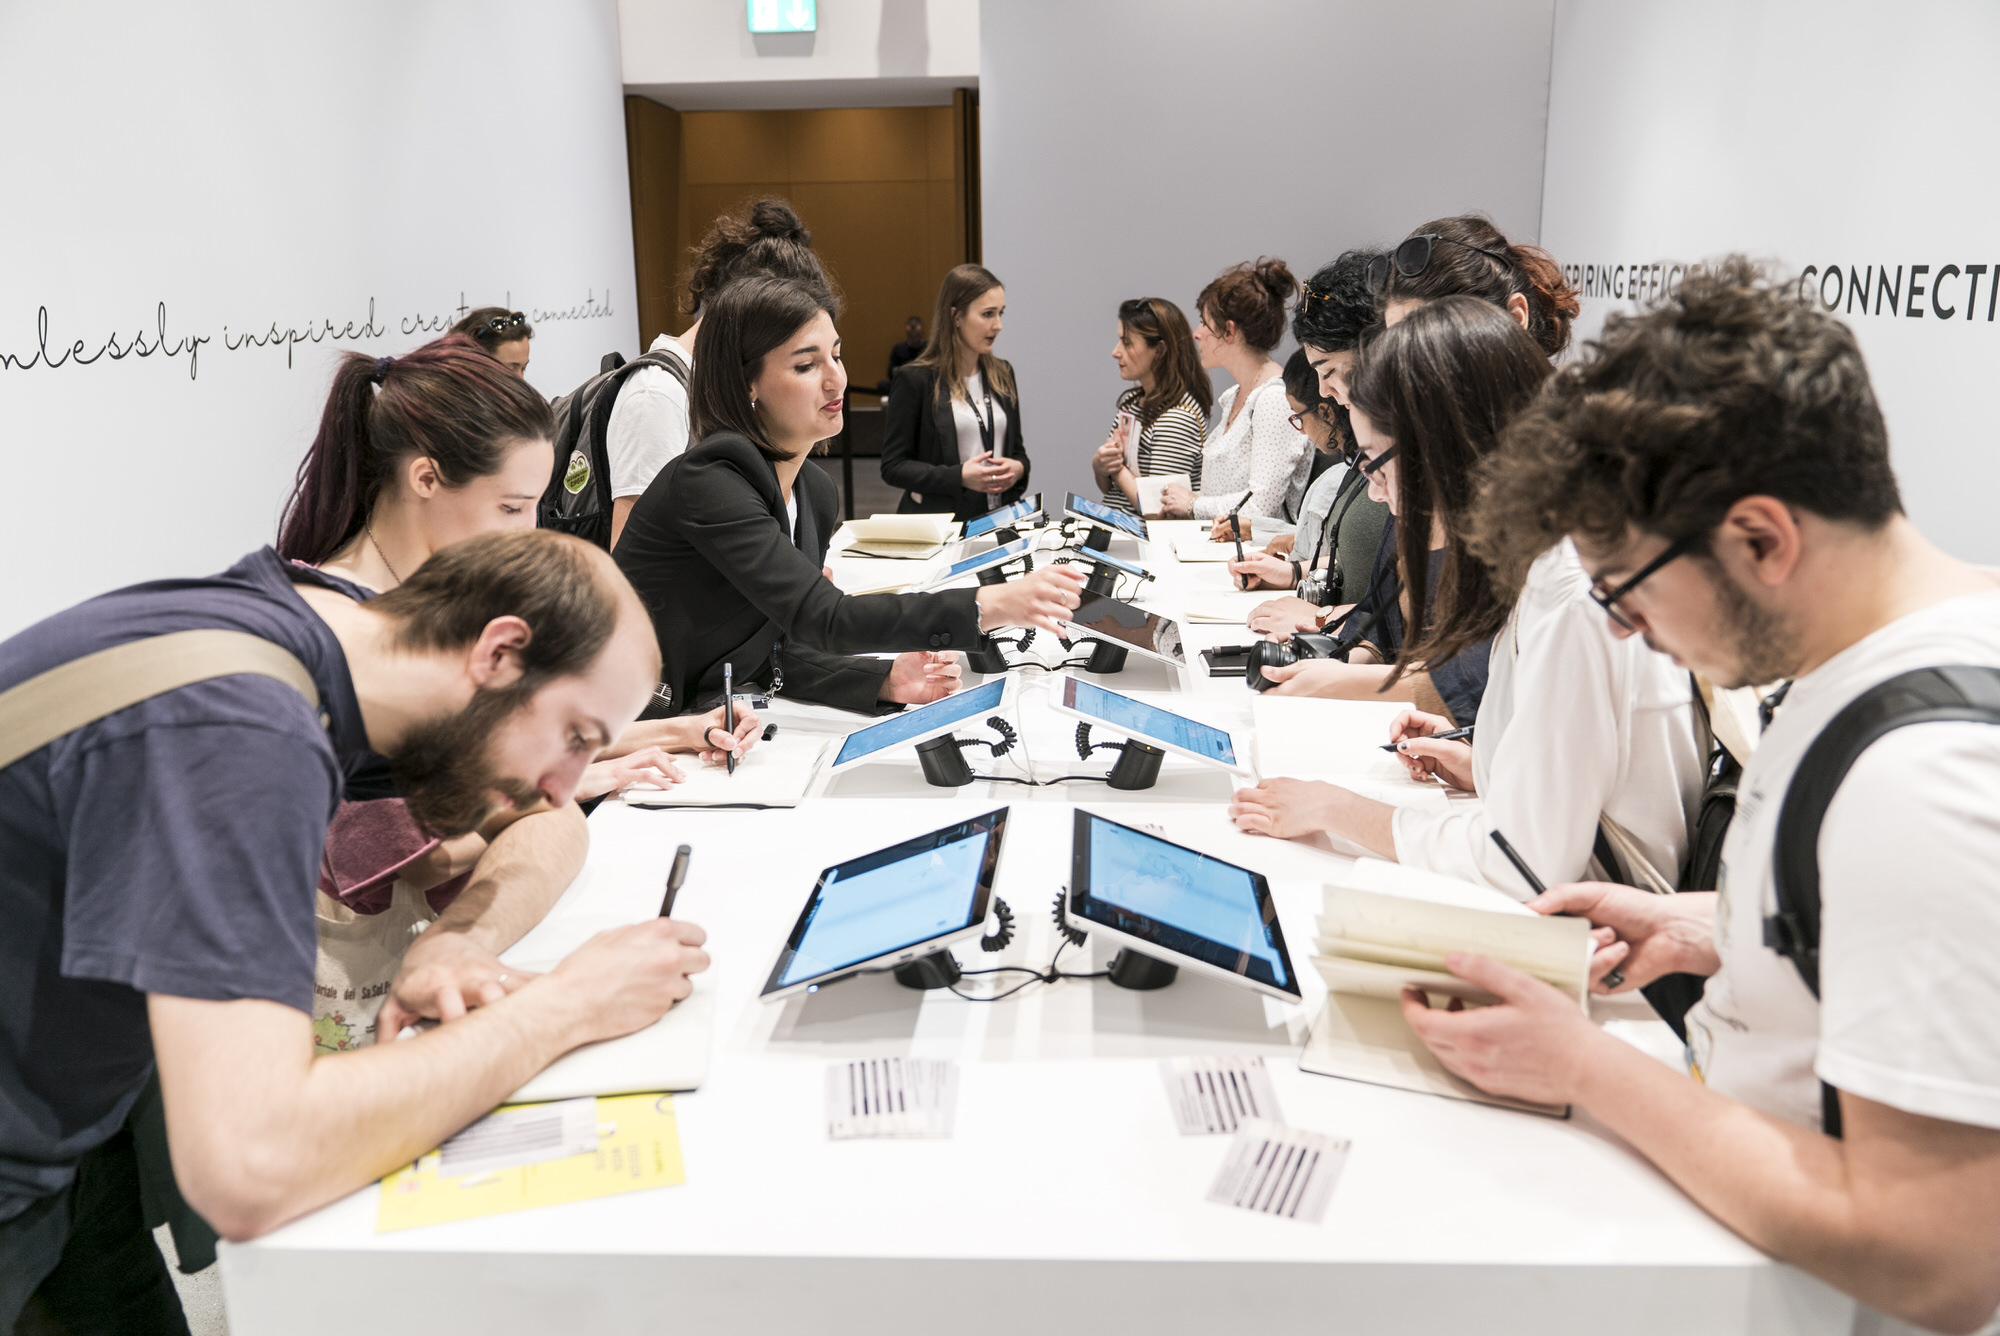 moleskine-milan-design-week-gruppo-peroni-eventi-02